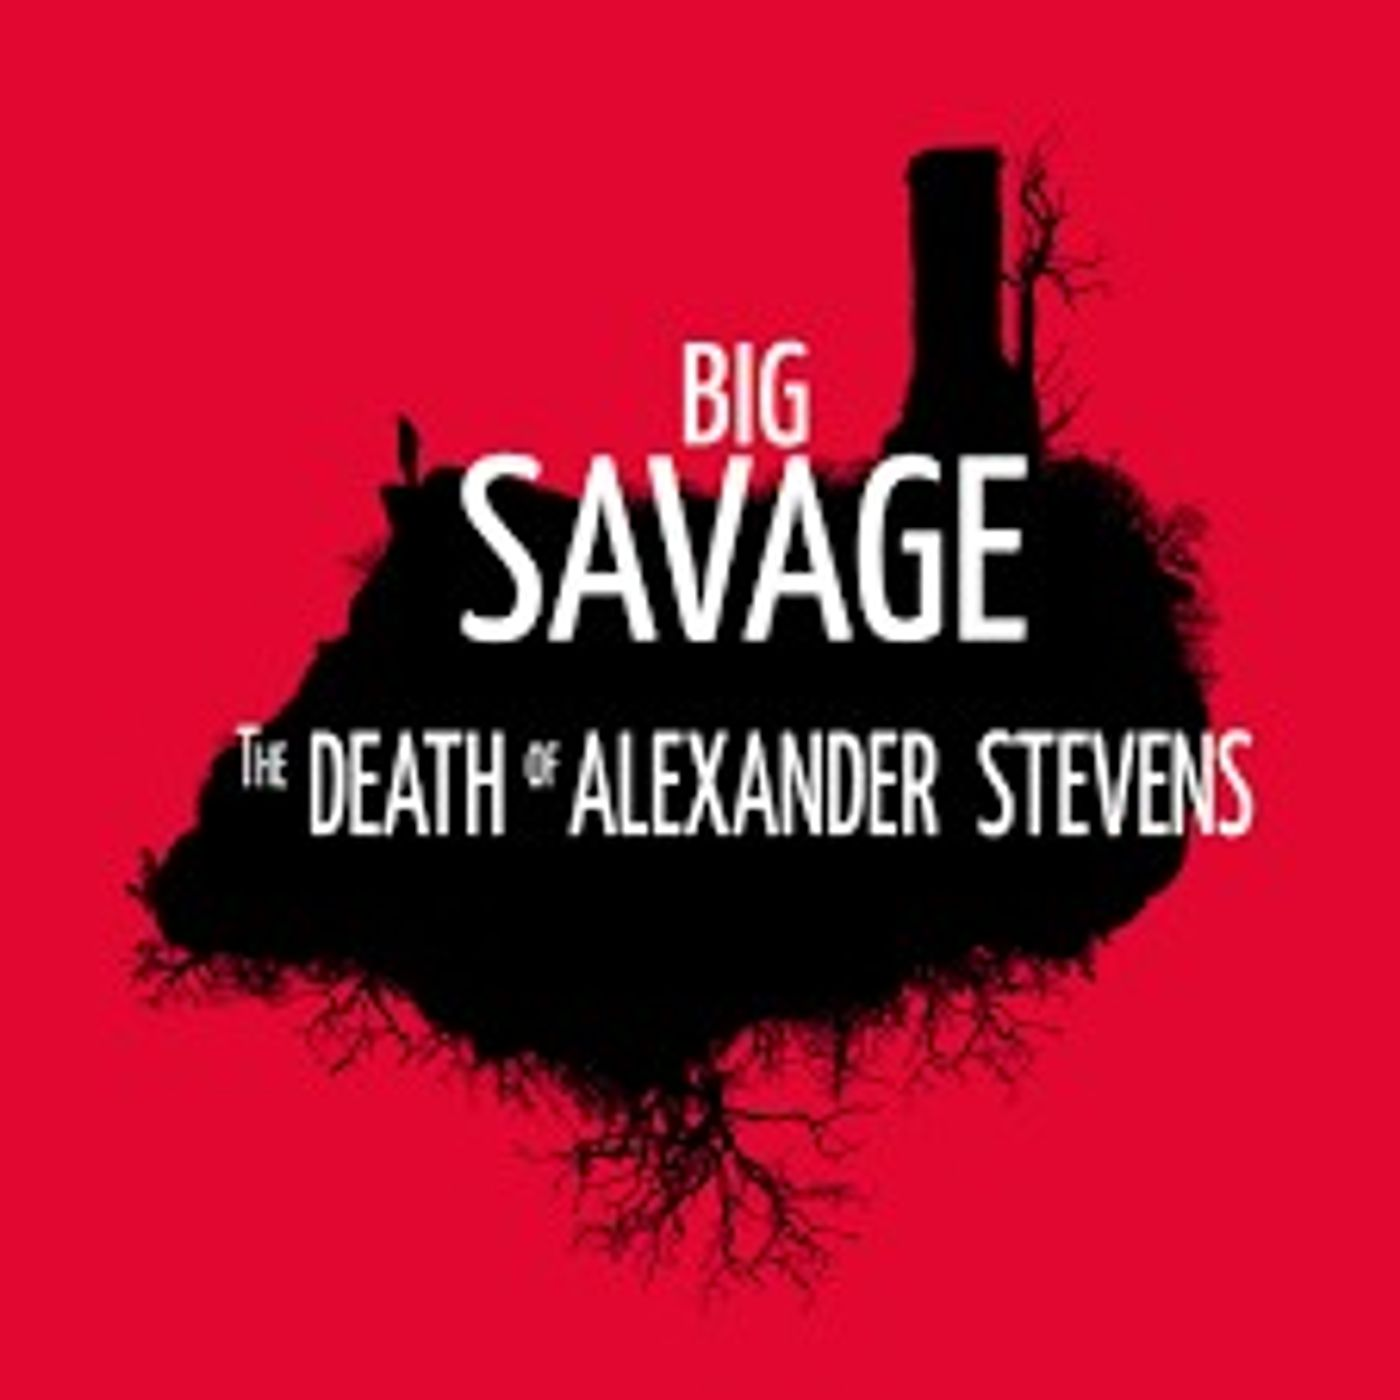 Personal Revelations | Big Savage: The Death of Alexander Stevens